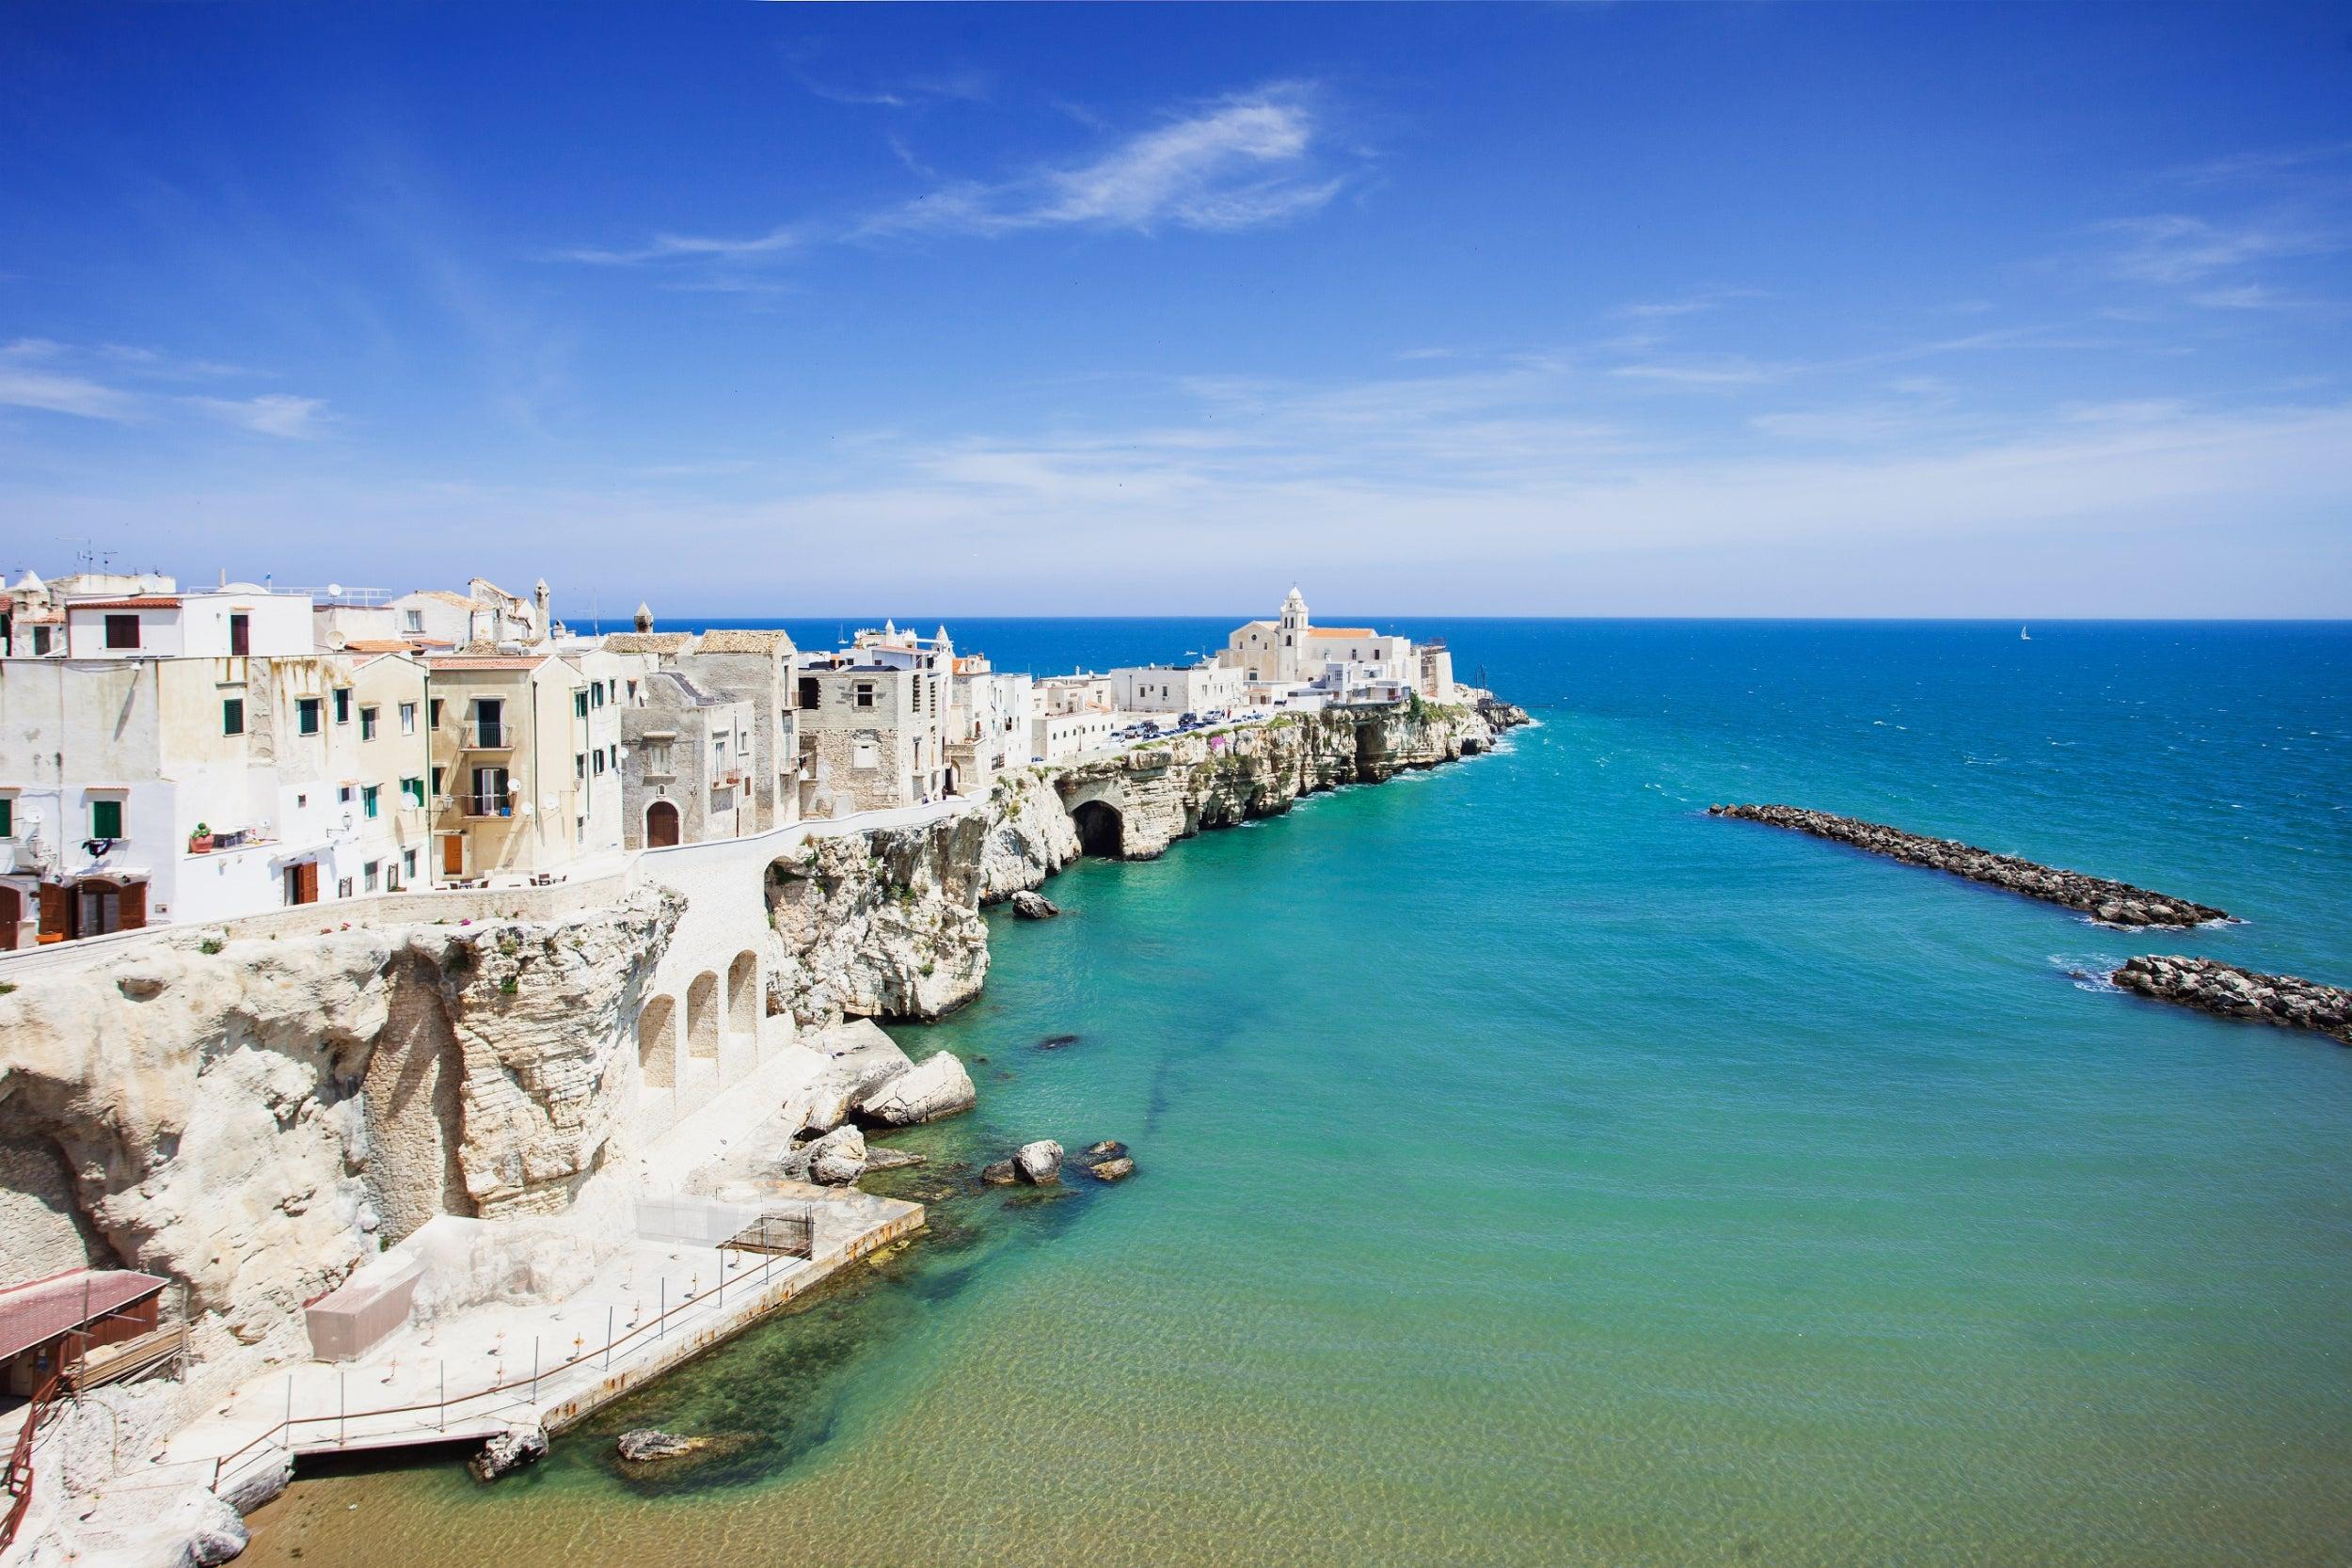 Puglia, Italy: Baroque architecture and Adriatic beaches in Italy's heel